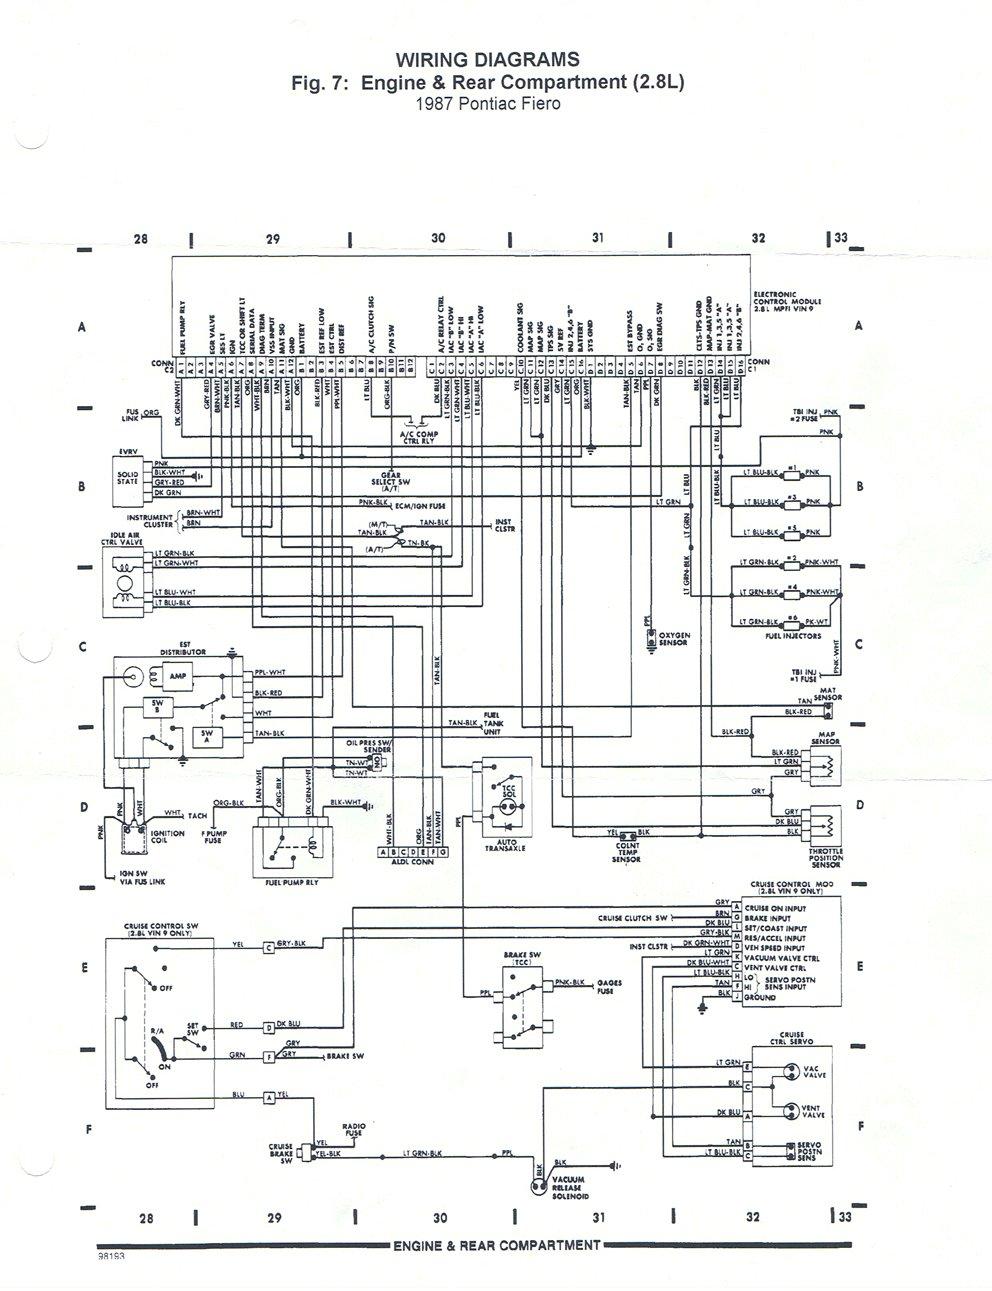 Magnificent Fiero Exhaust System Diagram Basic Electronics Wiring Diagram Wiring Cloud Xortanetembamohammedshrineorg